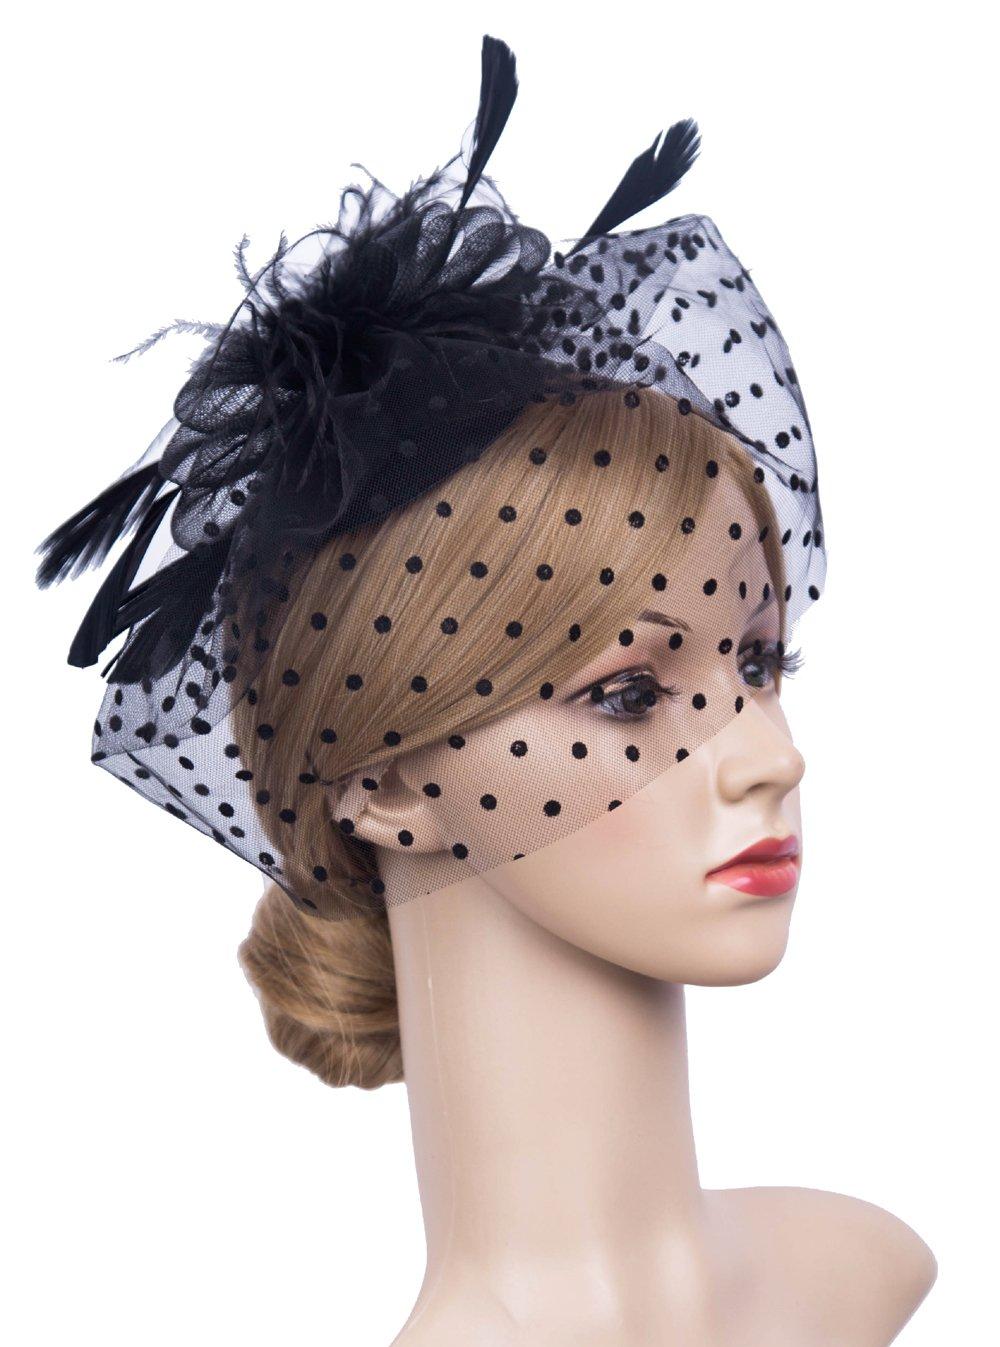 K.CLASSIC Fascinators Hat Vintage Mesh Net Felt Pillbox Flower Women Fascinator Hat Hair Clip (Black)